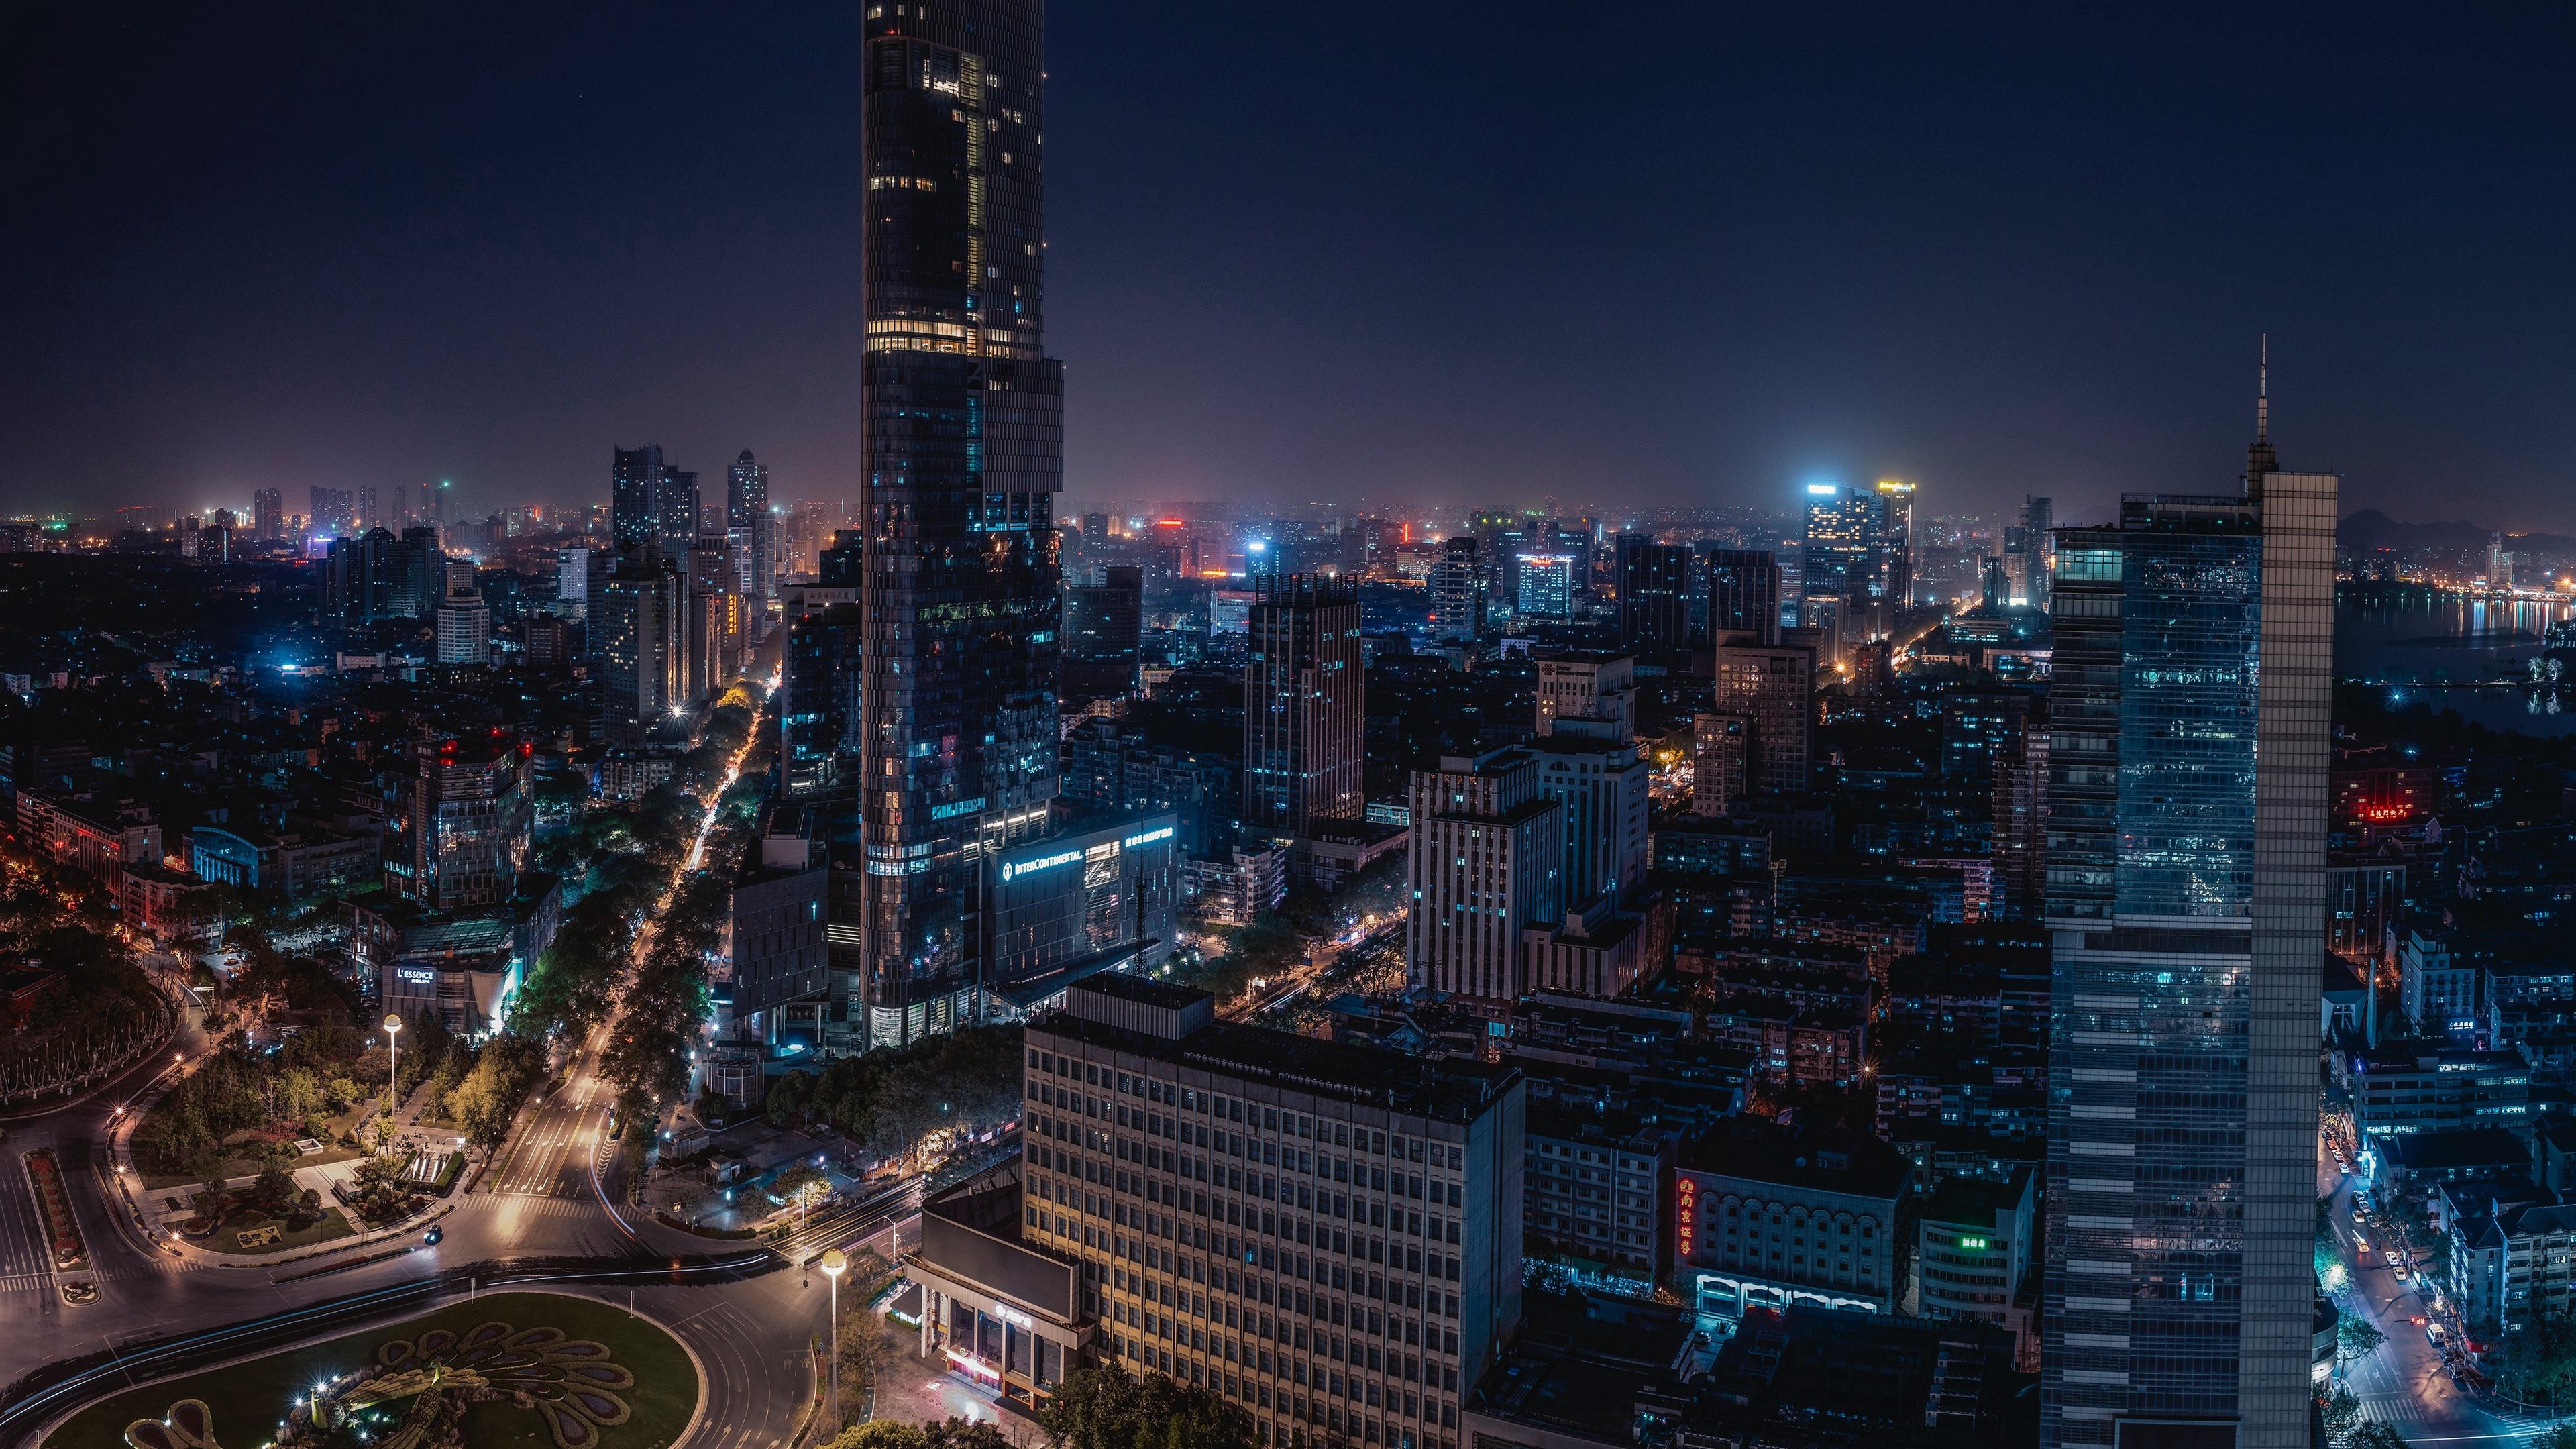 night city skyscrapers nanjing china 4k 1538066826 - night city, skyscrapers, nanjing, china 4k - Skyscrapers, night city, nanjing